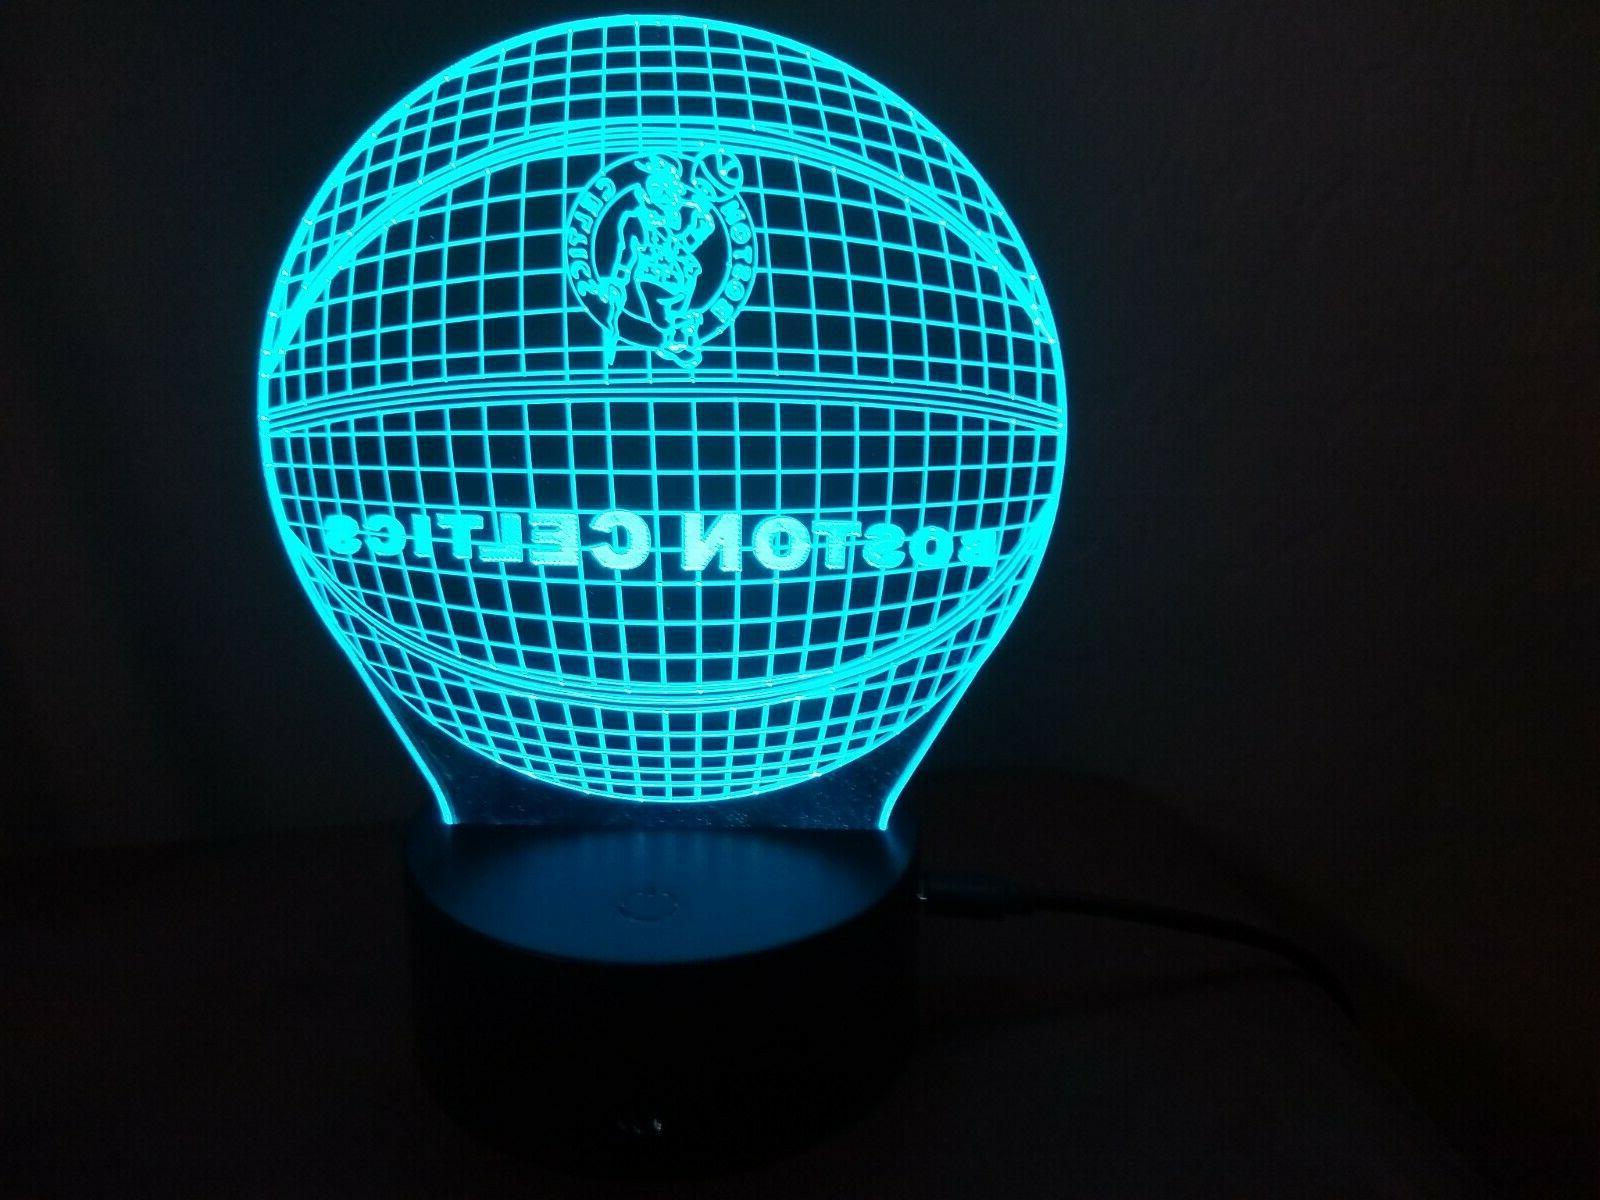 New Celtics Color LED Lamp Light / Man